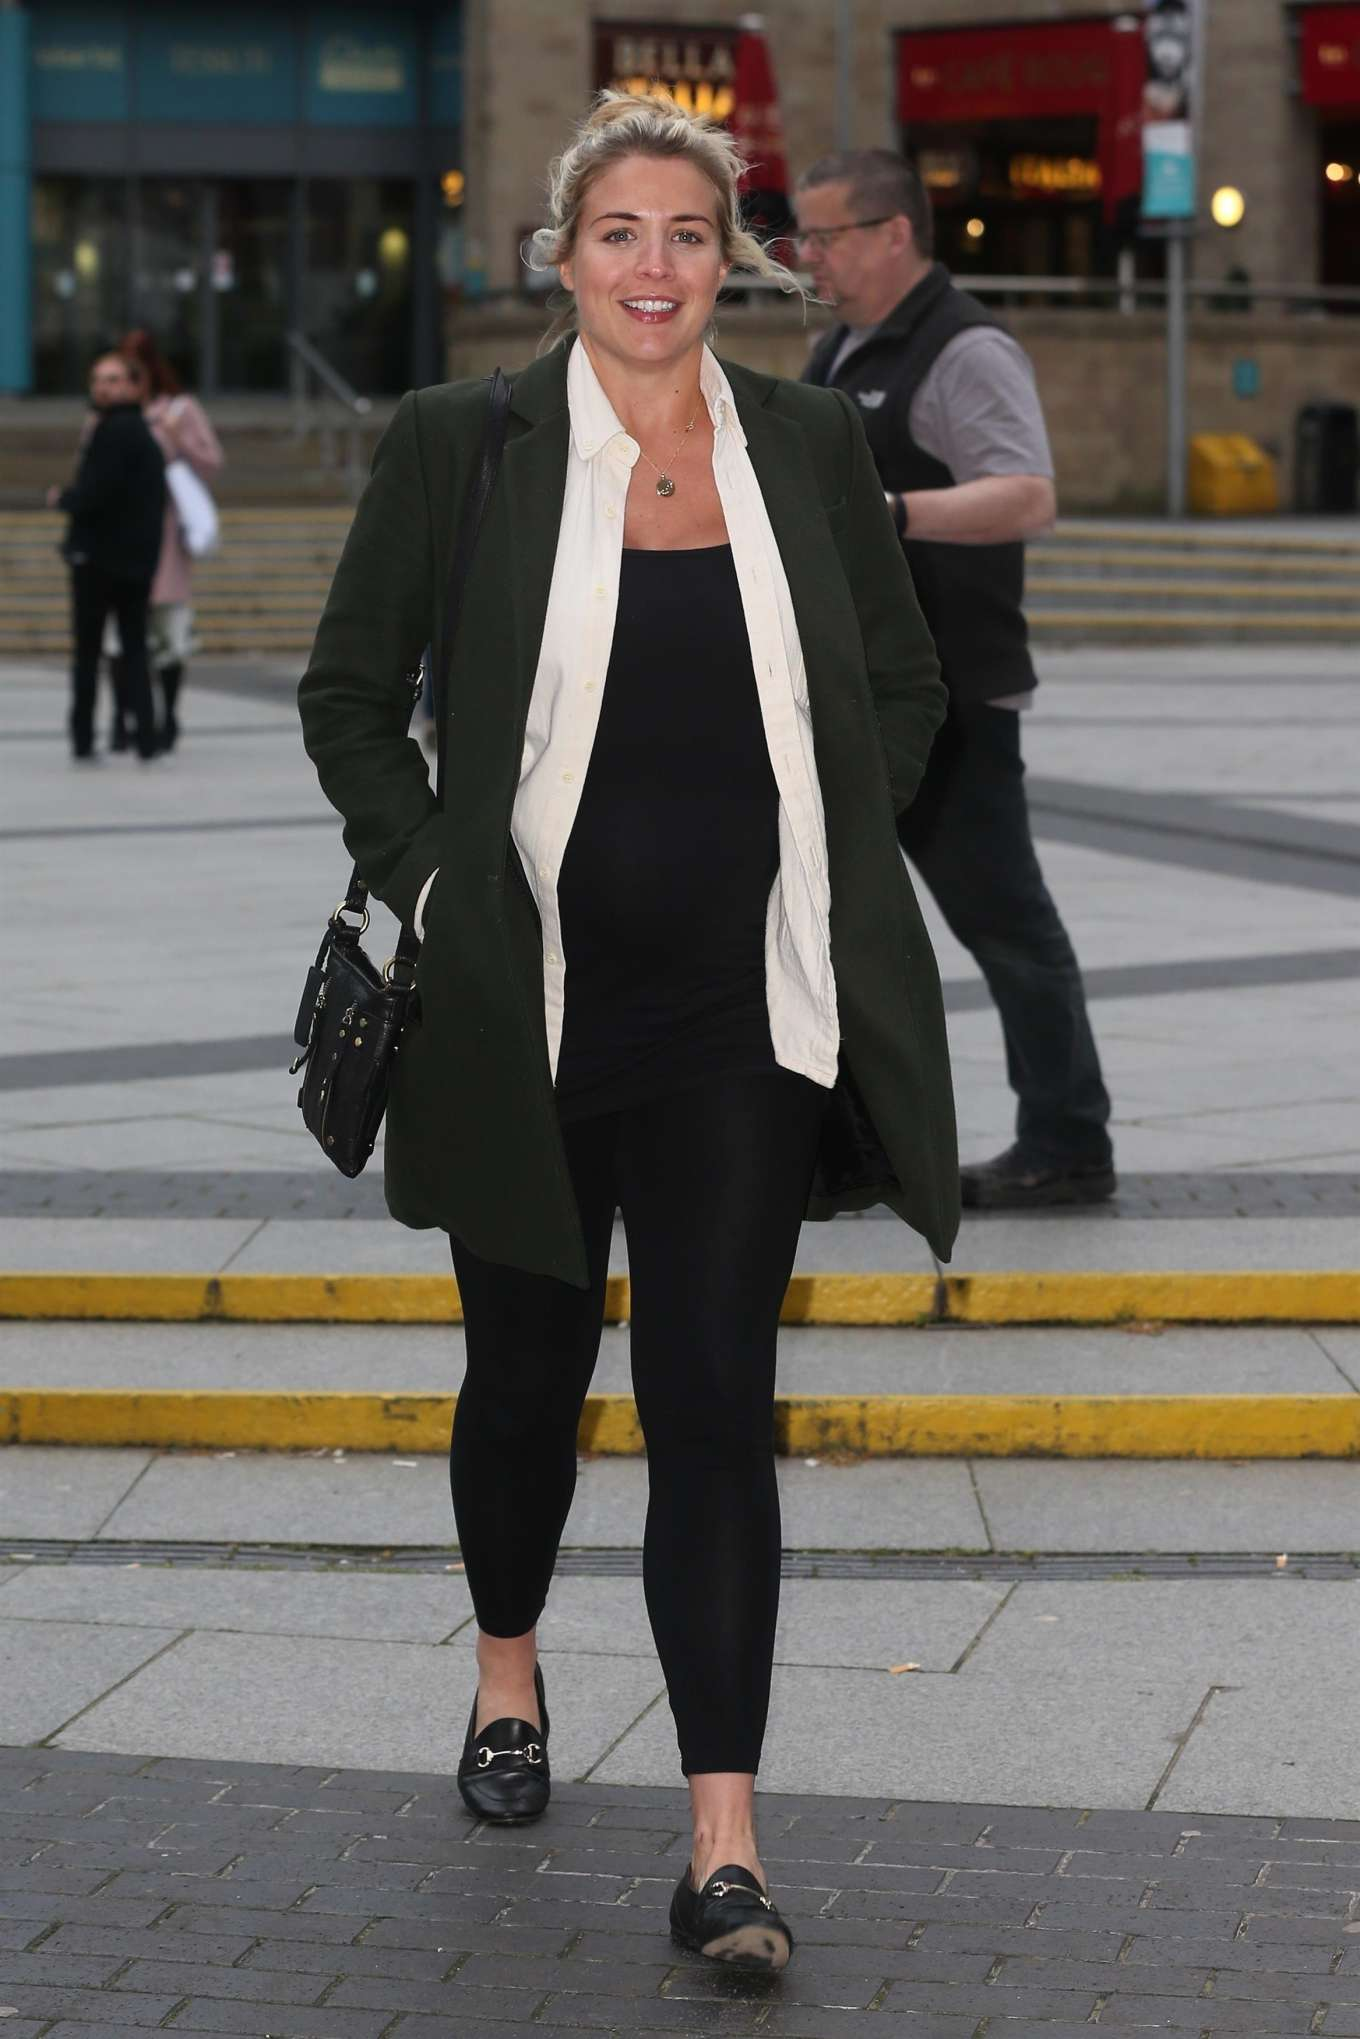 Gemma Atkinson 2019 : Gemma Atkinson :Arriving at The Lowry -03